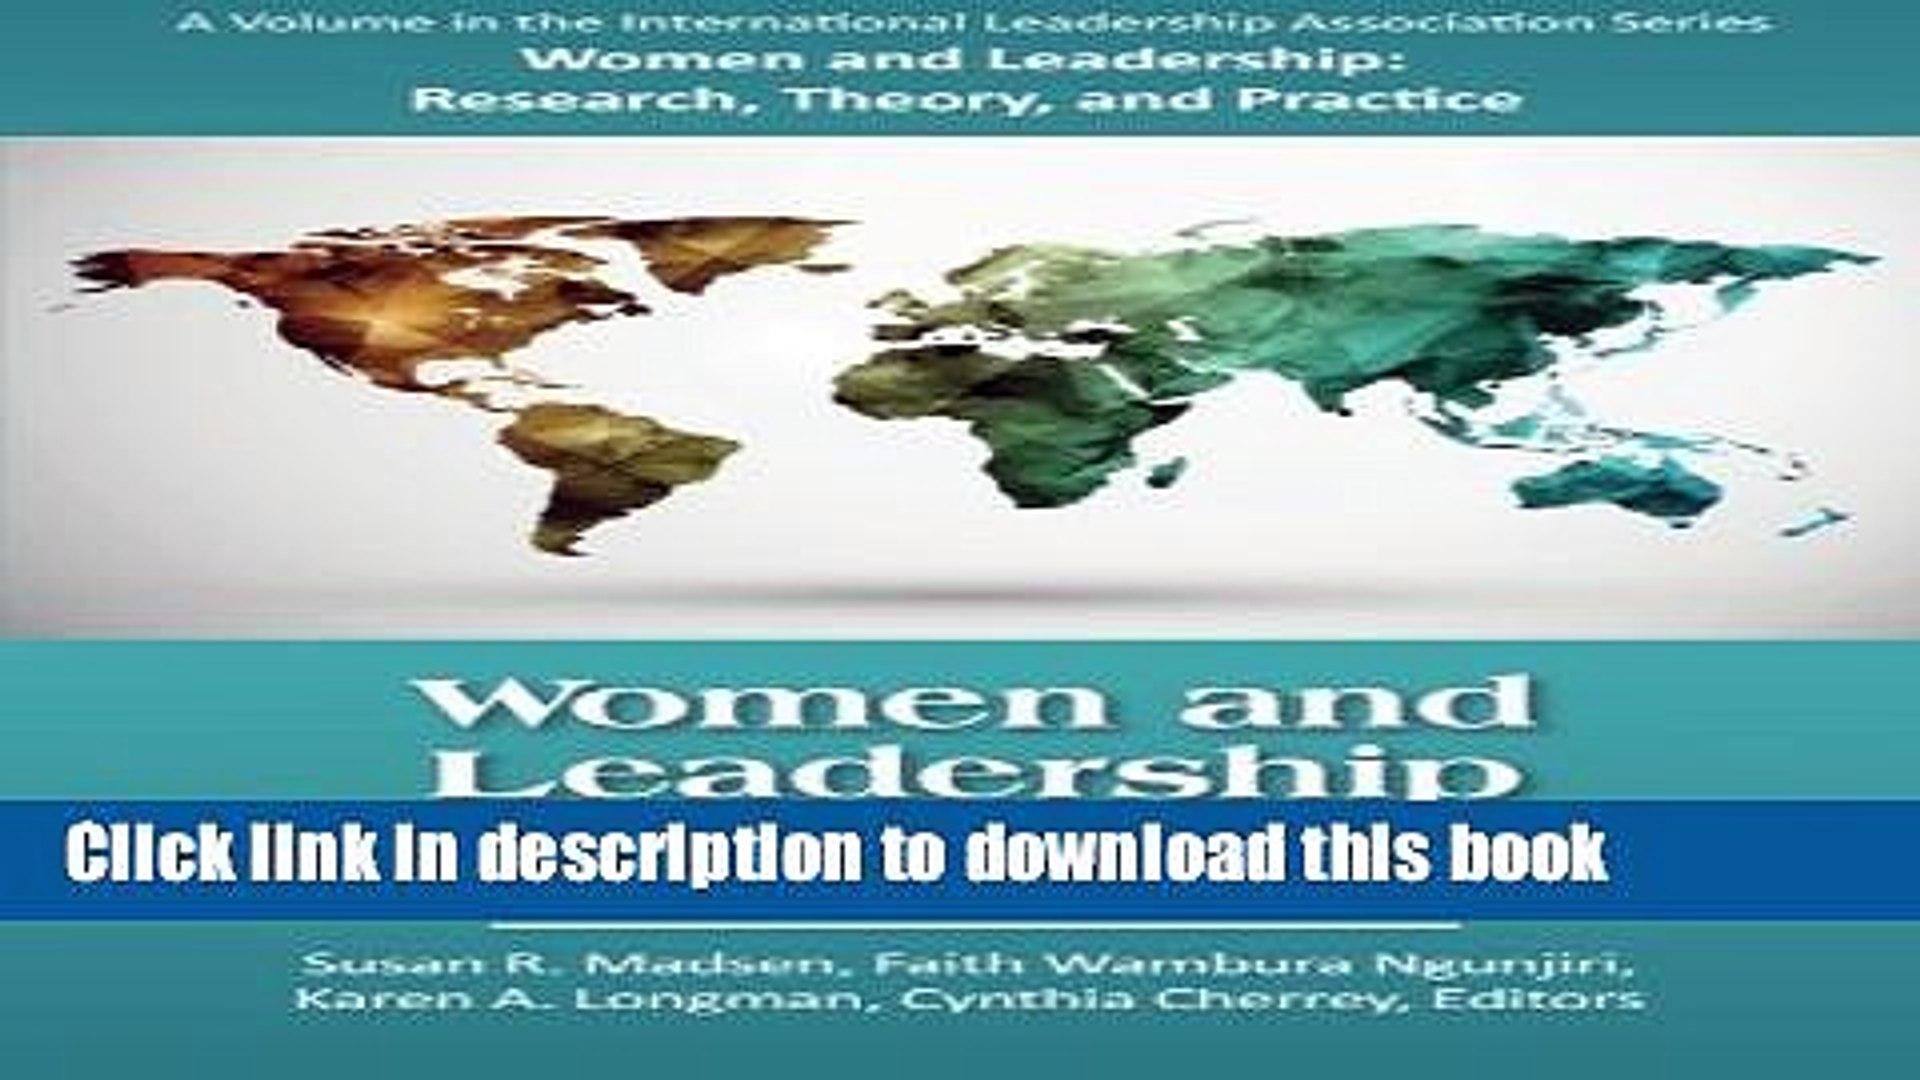 [Popular] Women and Leadership around the World Hardcover Online